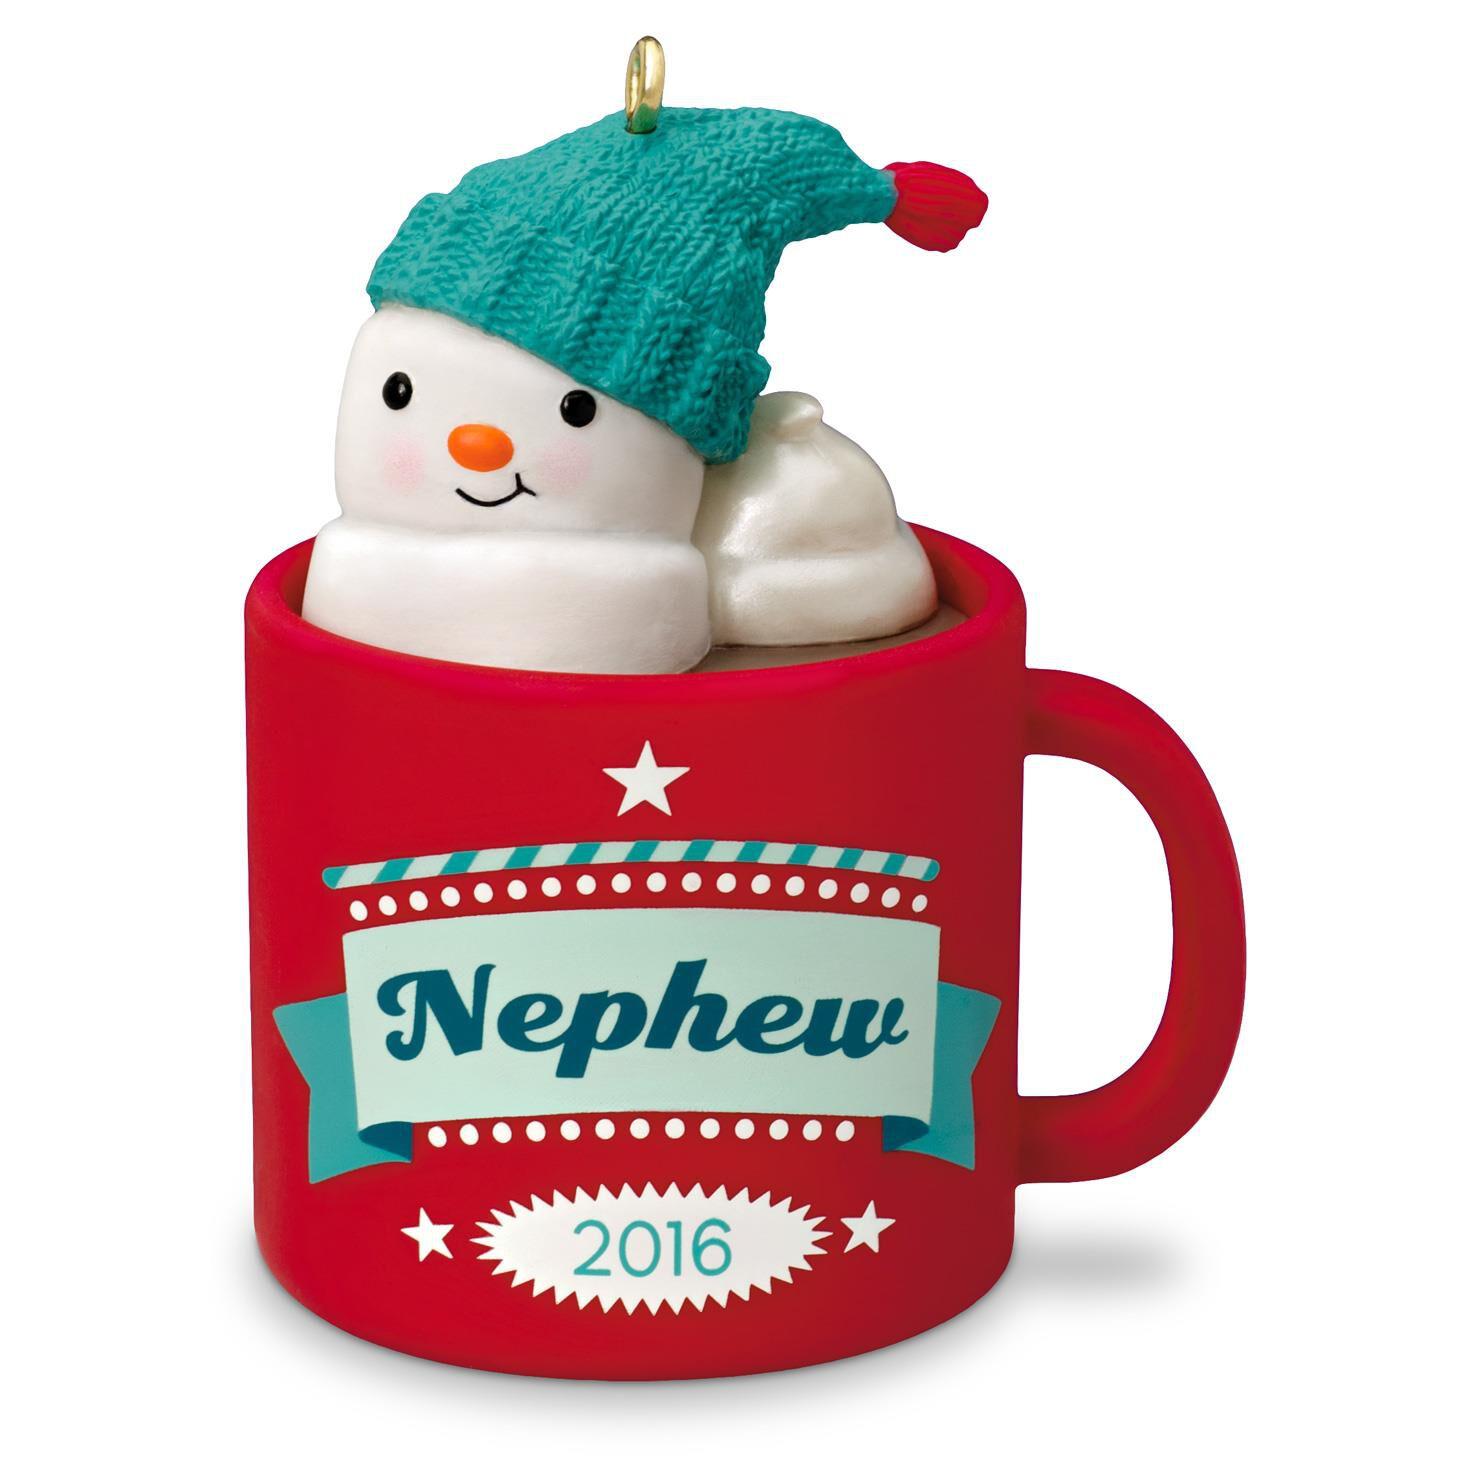 nephew hot cocoa mug and marshmallow snowman ornament keepsake